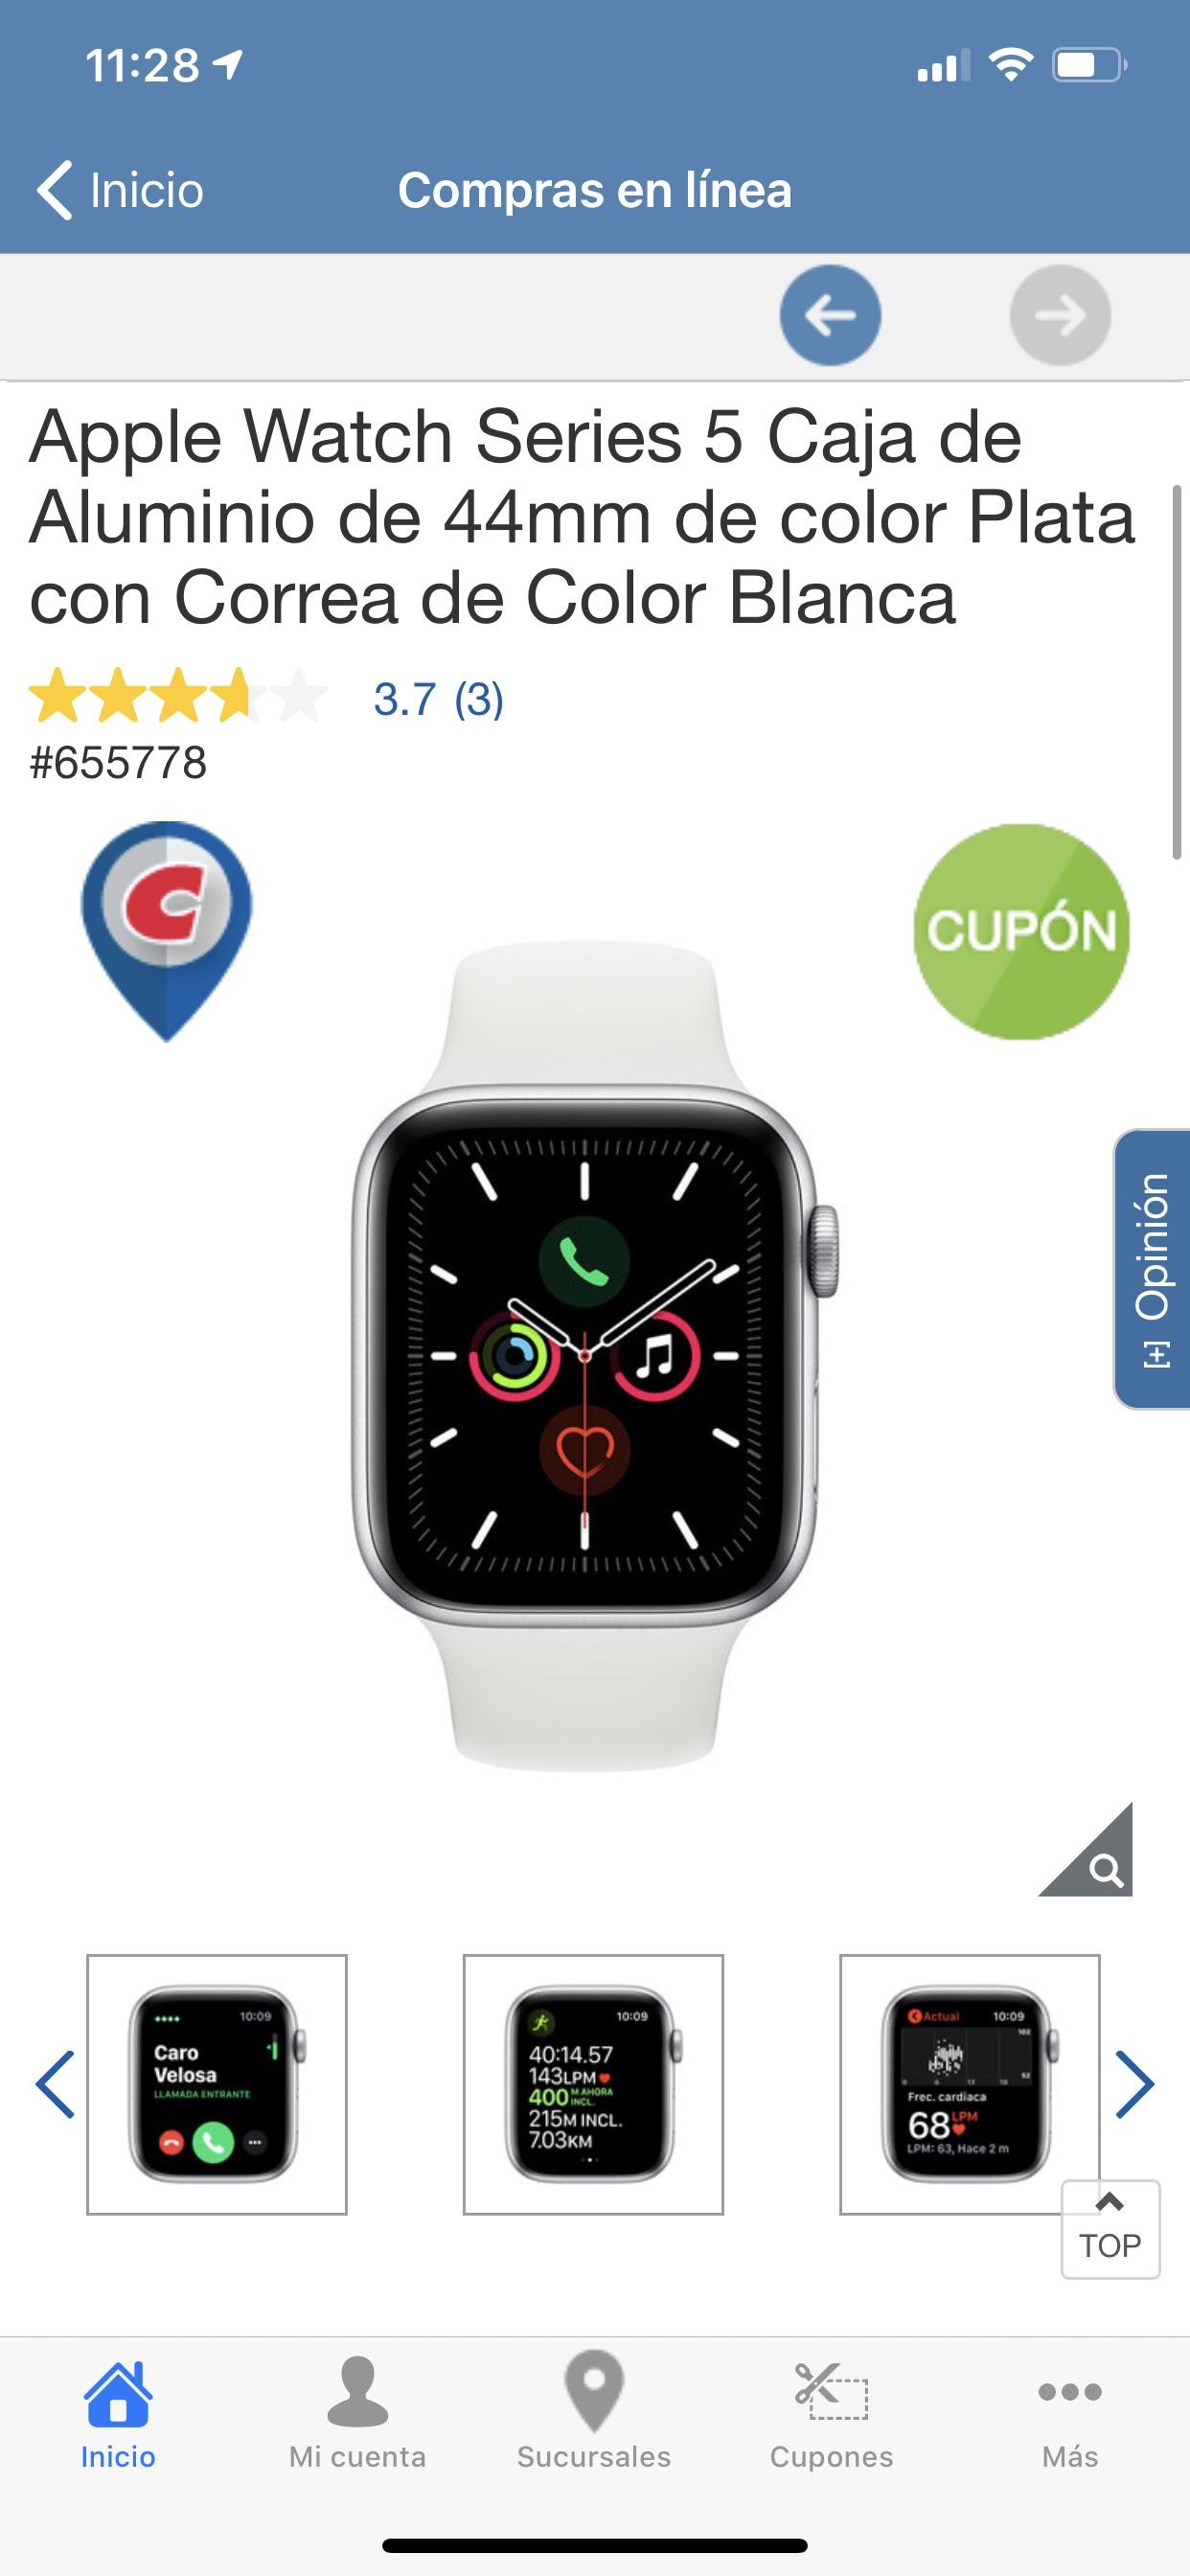 costco Apple Watch Serie 5 Caja de Aluminio 44mm